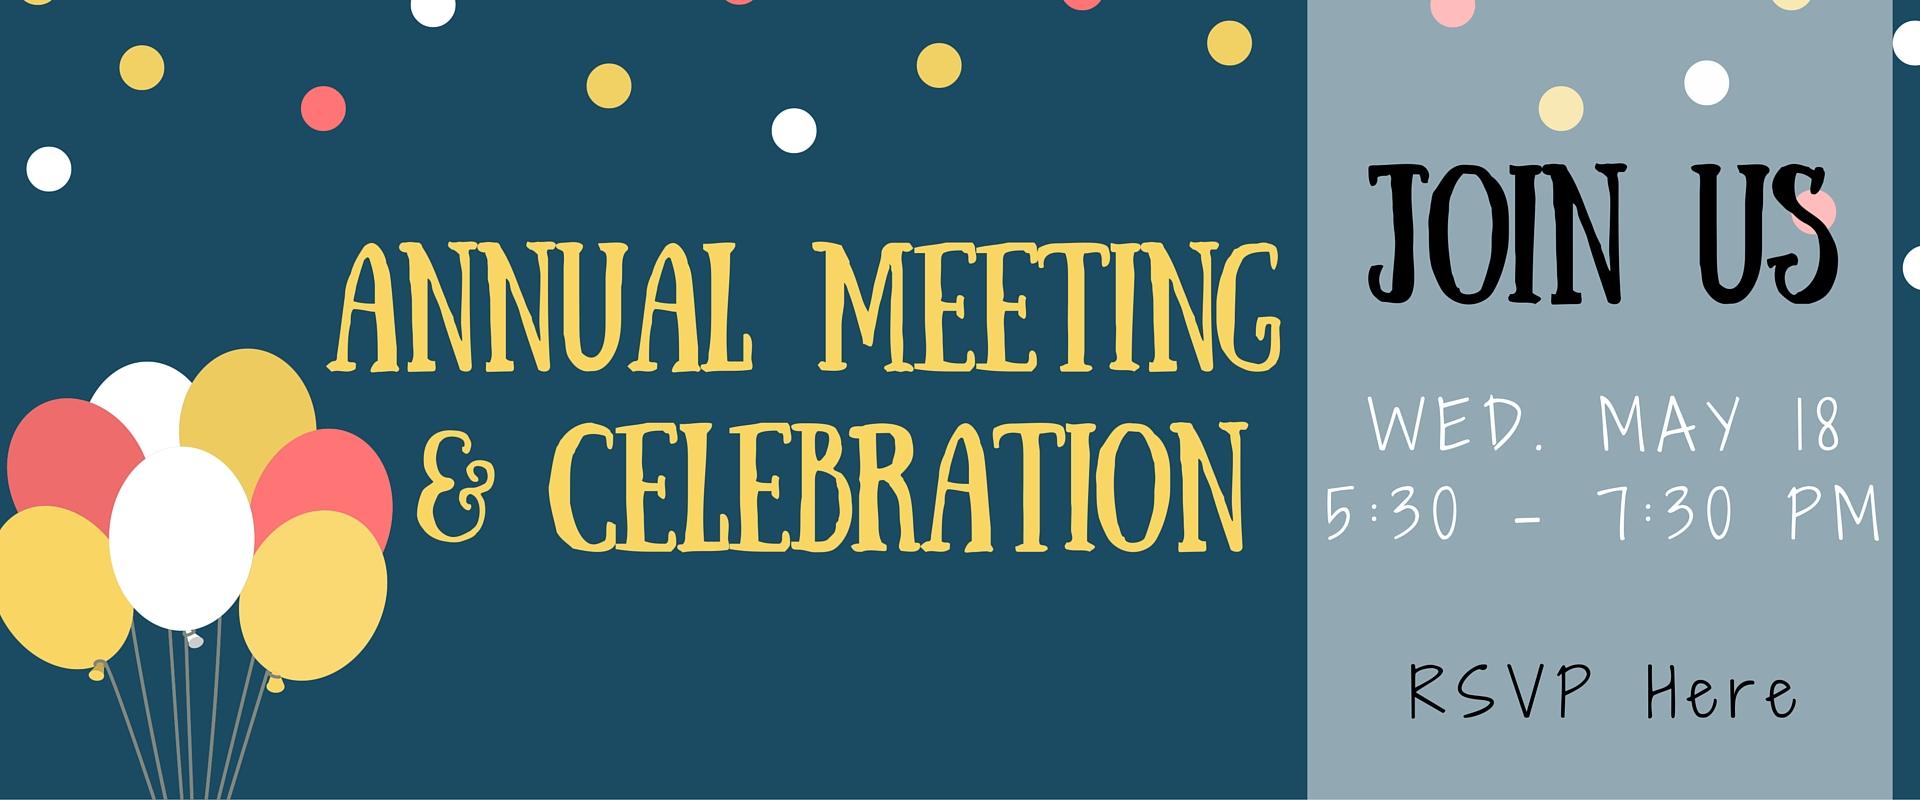 Annual-Meeting-Banner